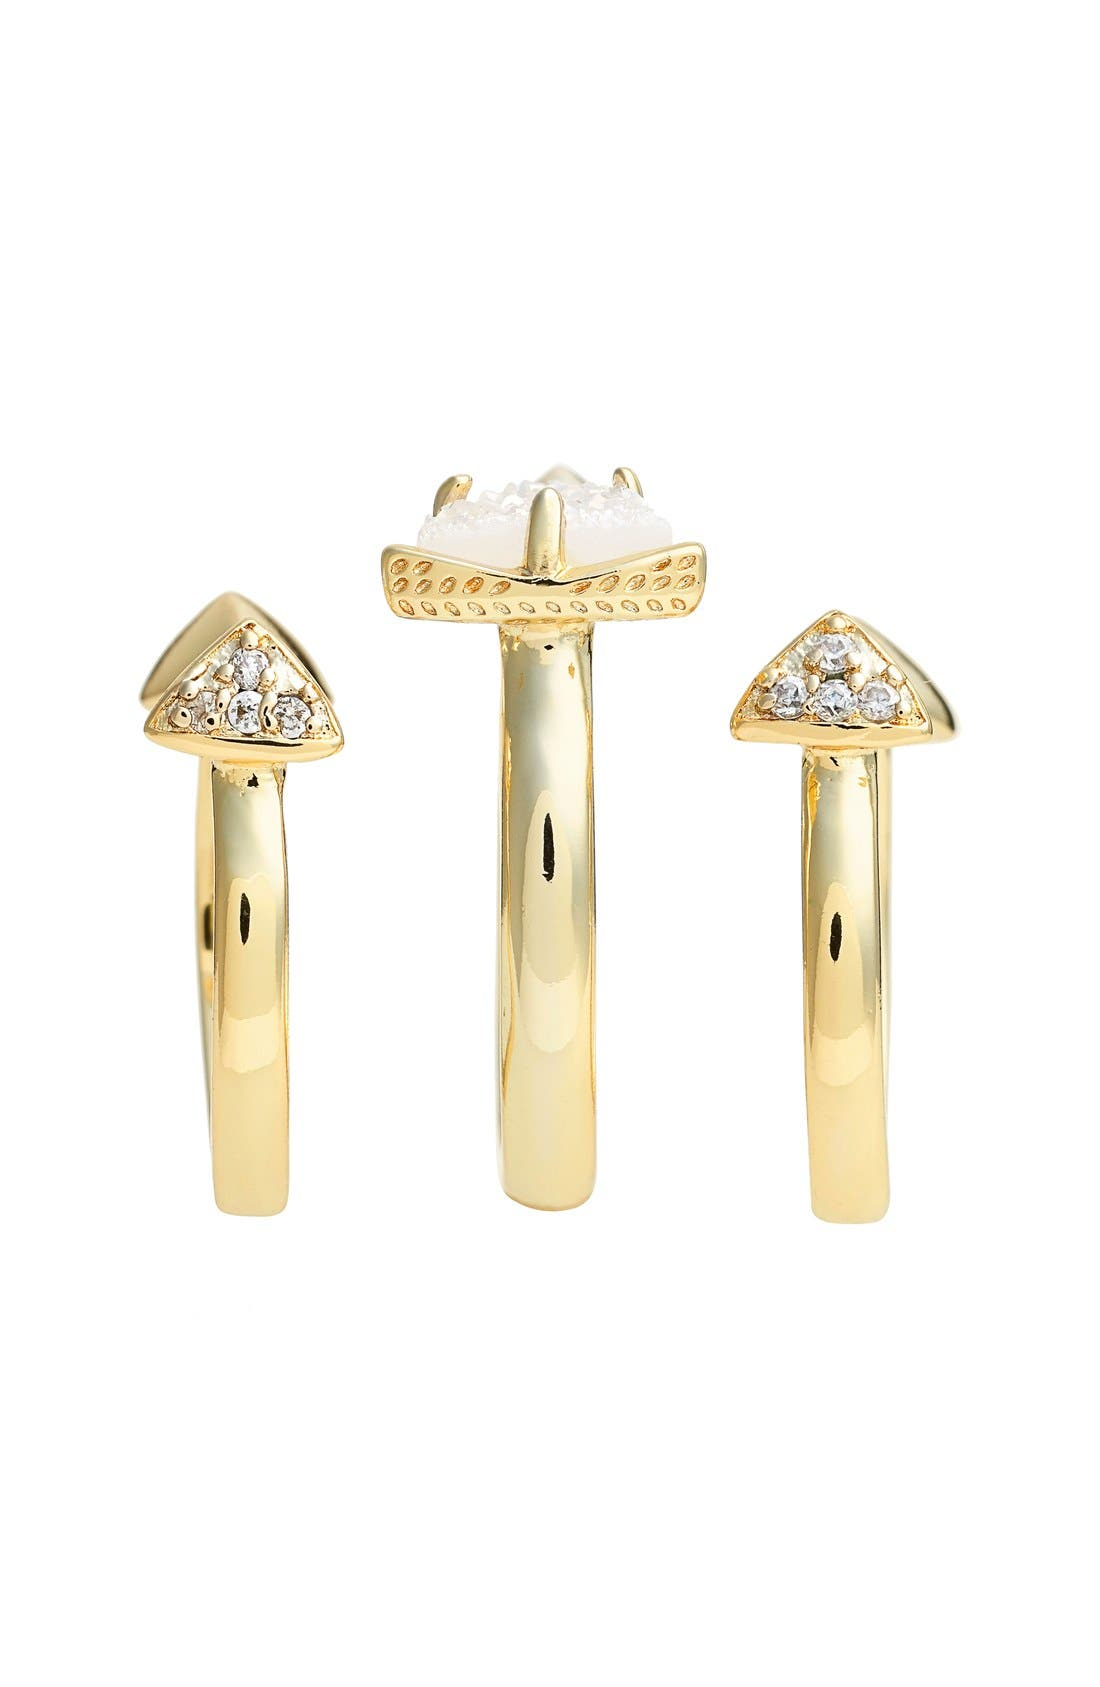 Alternate Image 2  - Kendra Scott 'Brennan' Spiked Open Ring & Midi Rings (Set of 3)